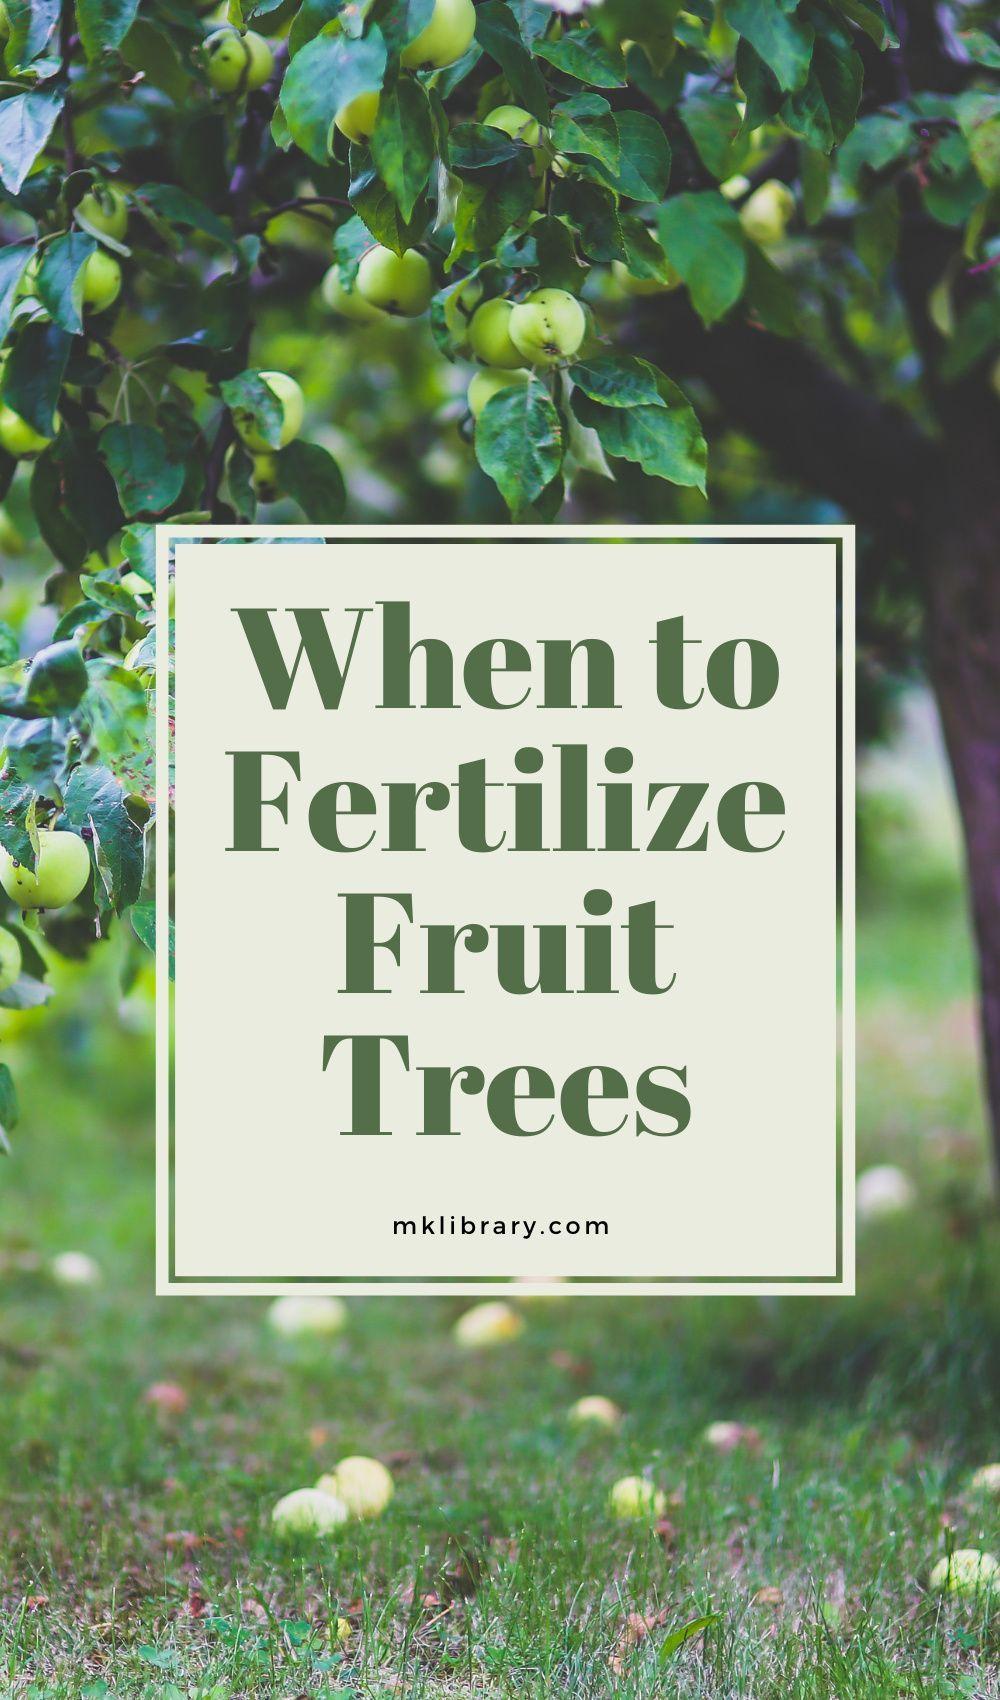 When To Fertilize Fruit Trees Mk Library Fruit Trees Fertilizer For Plants Fruit Garden